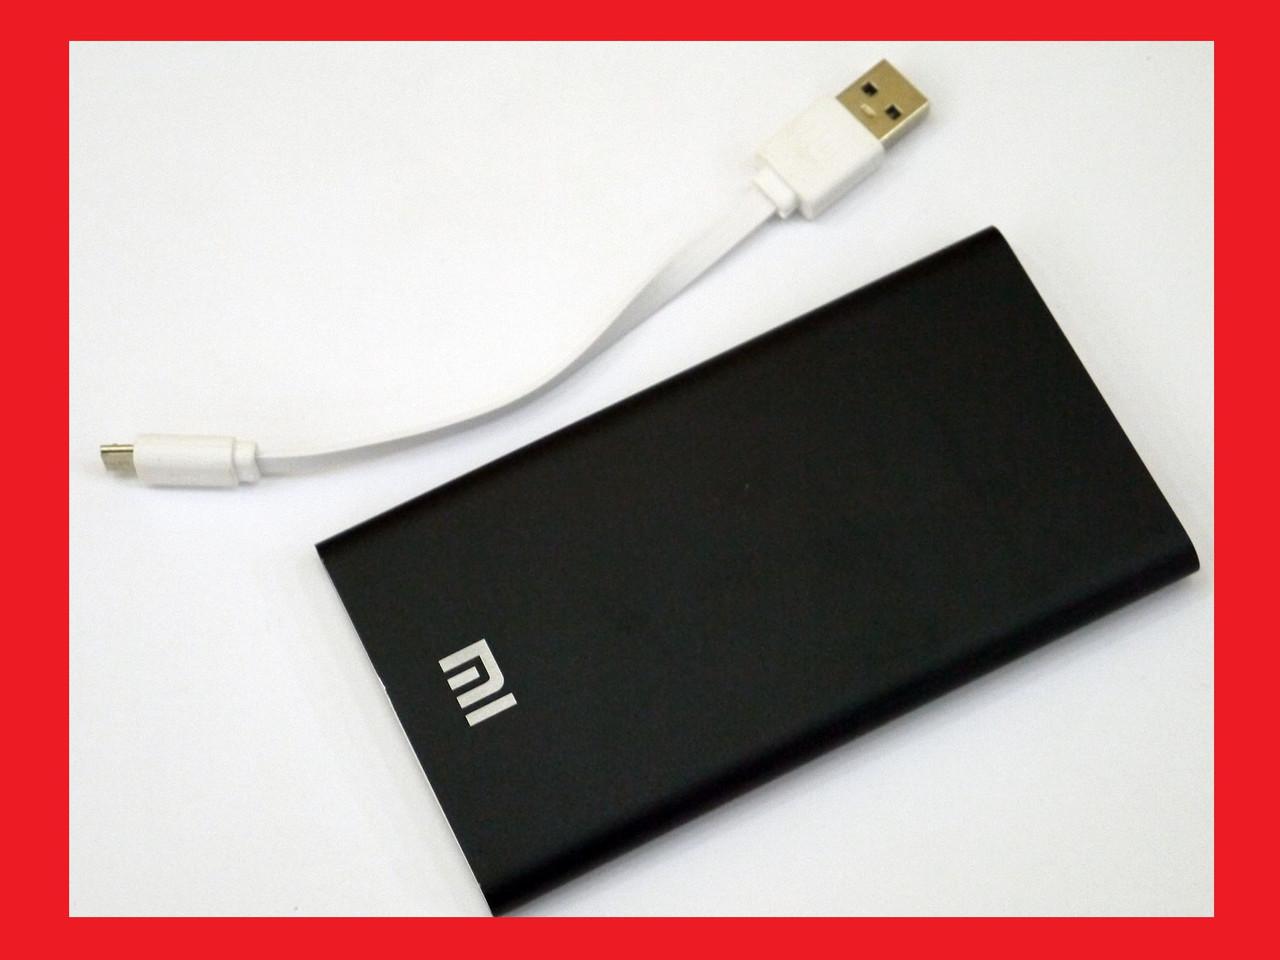 Xiaomi Mi 24000 mAh Power Bank Метал. корпус